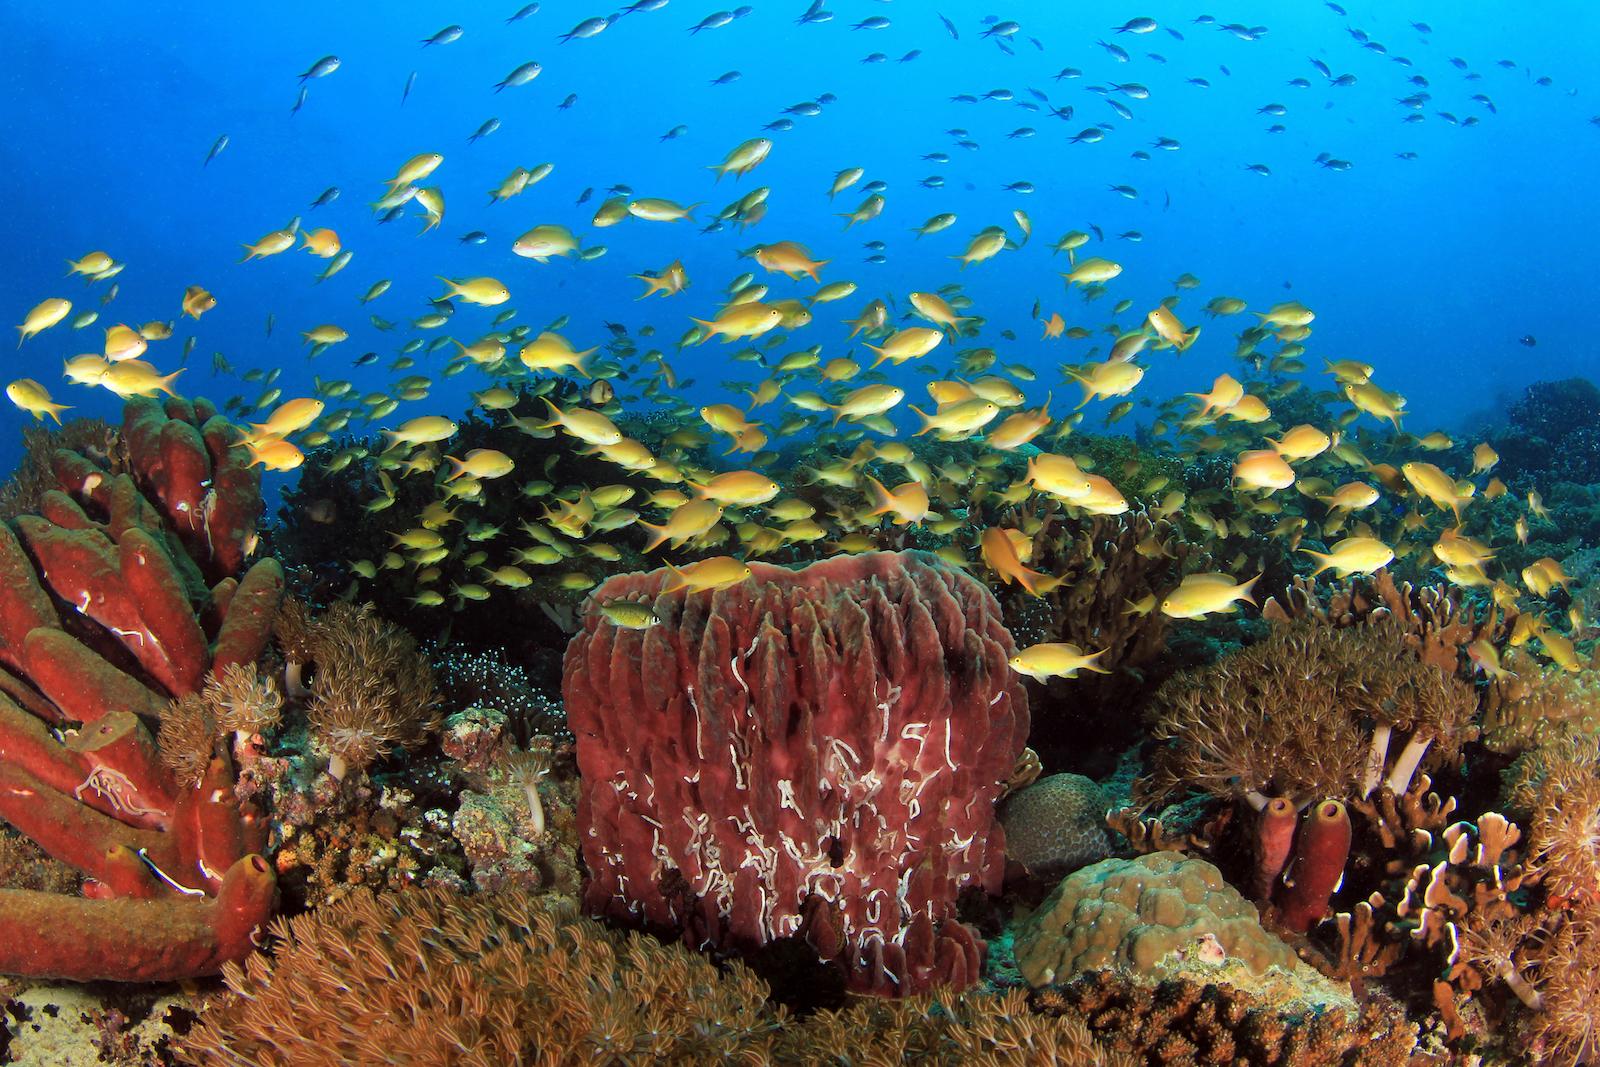 Moalboal Sardine Run & Pescador Island Turtles | Cebu Day Tour